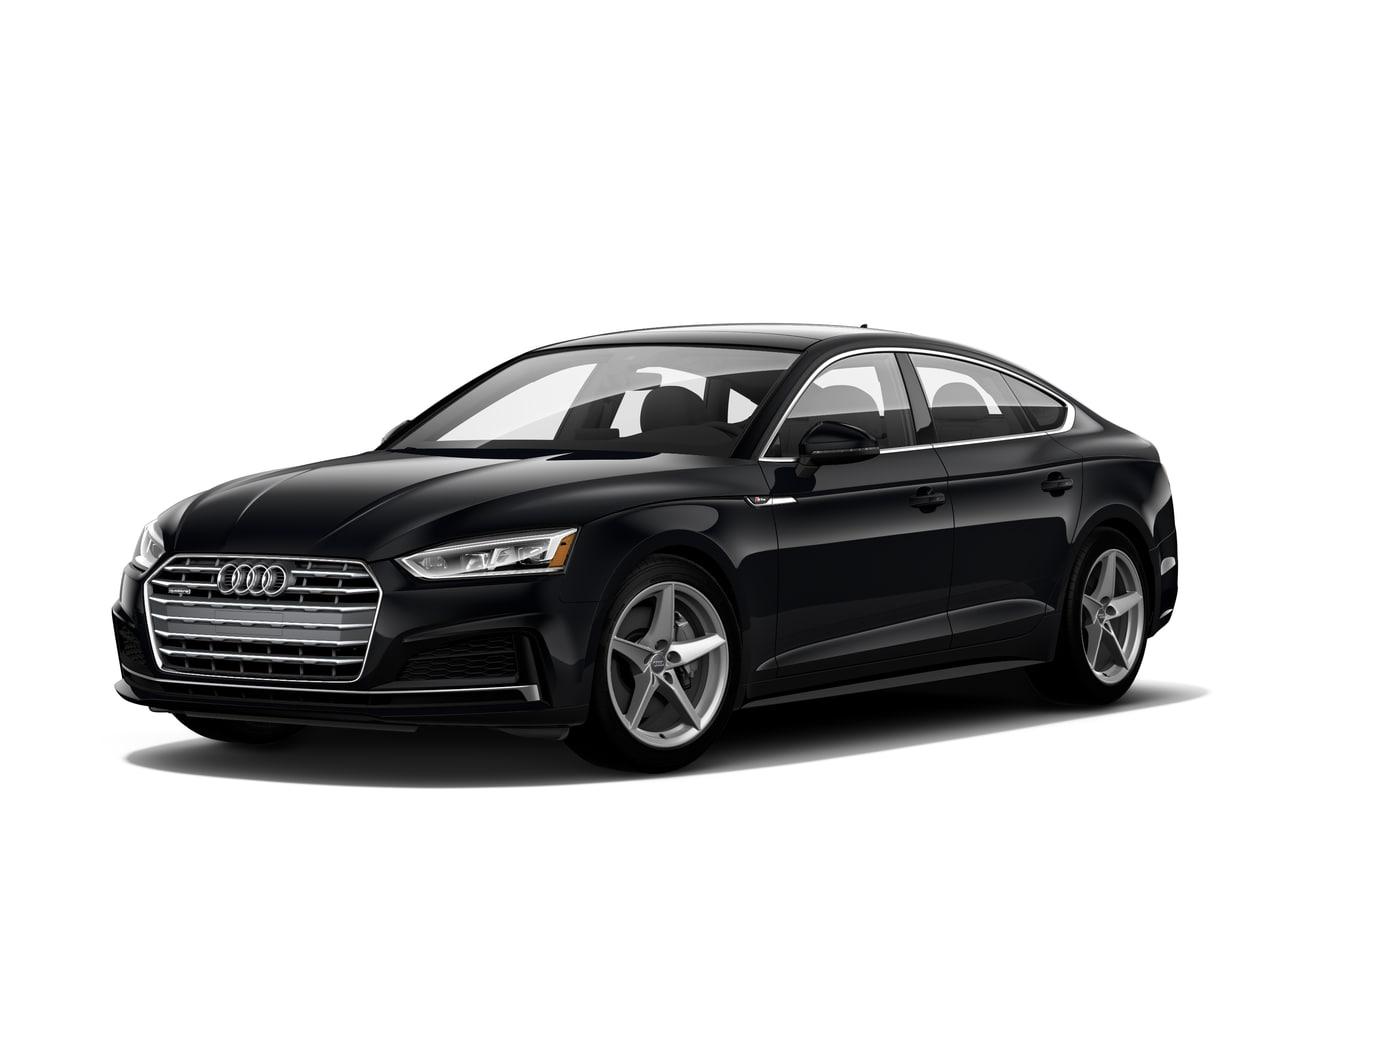 2019 Audi A5 Sportback